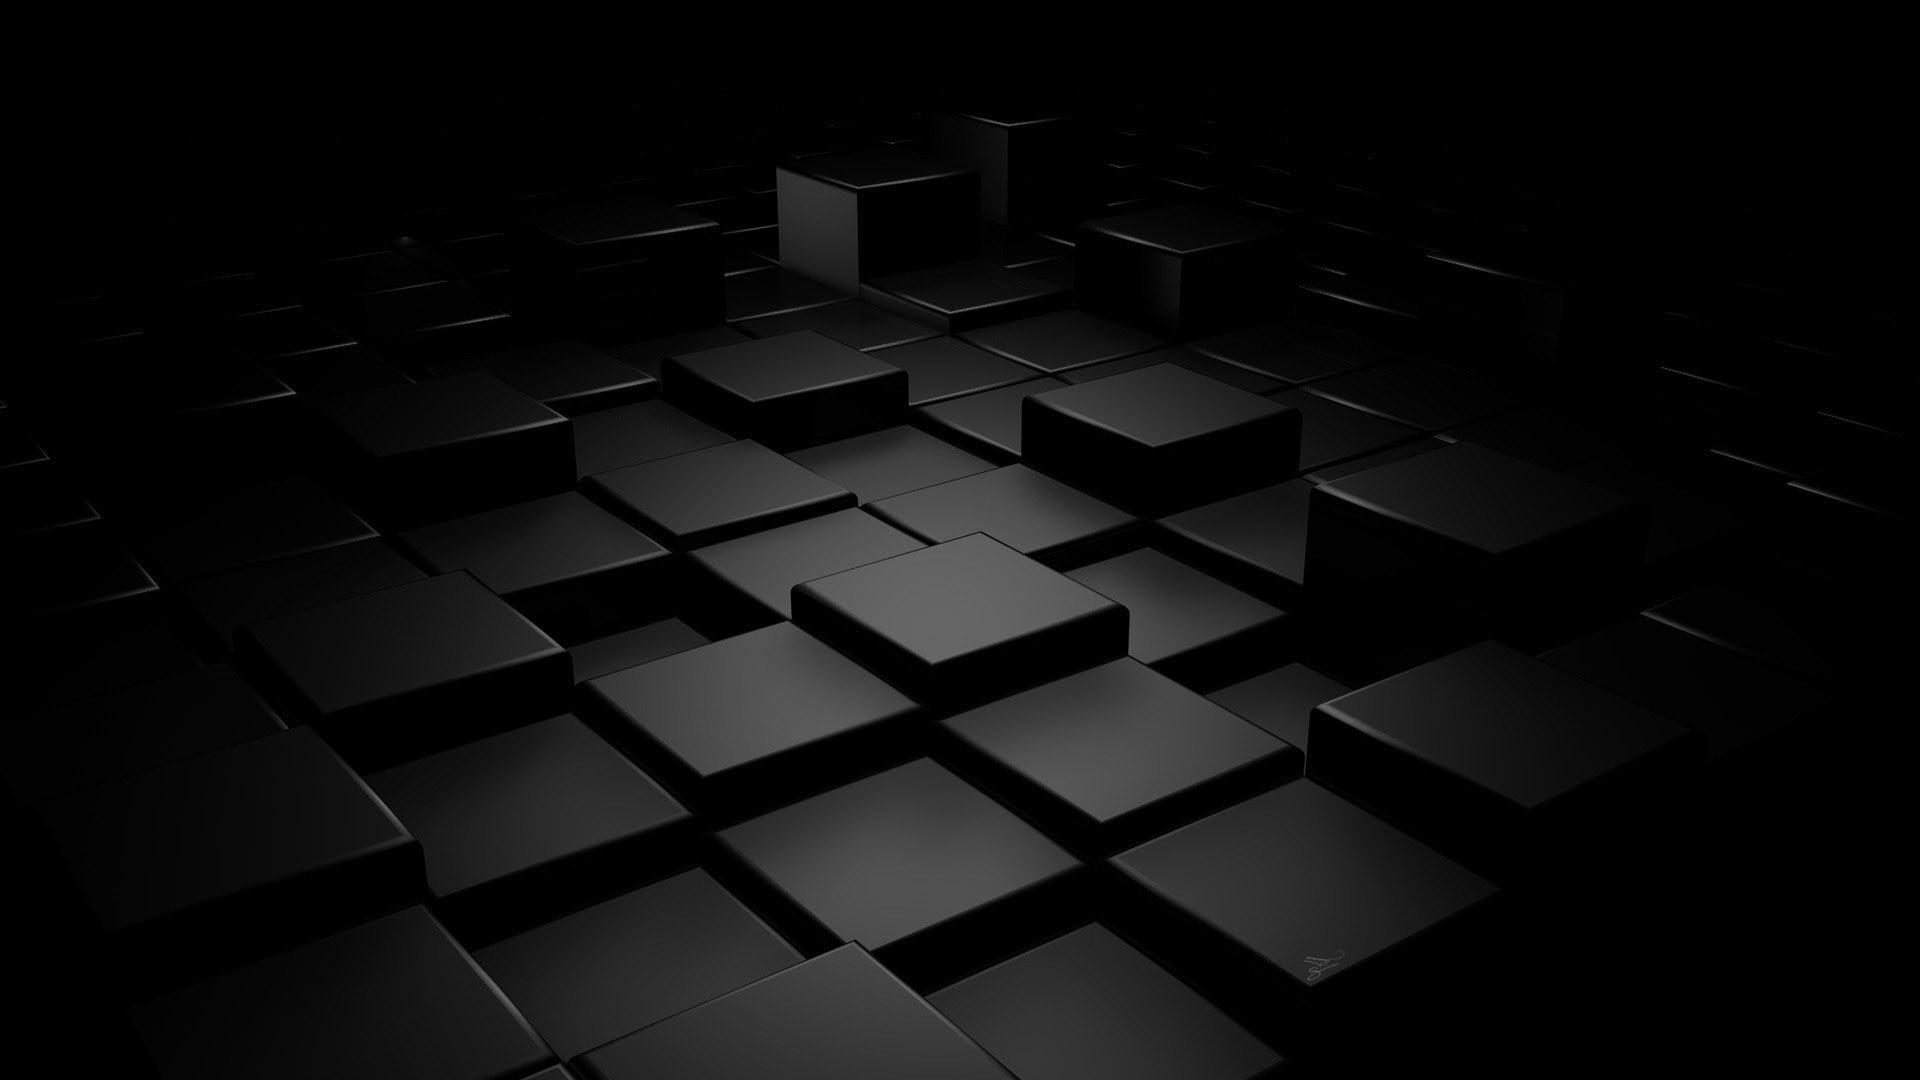 Black Abstract Wallpapers Desktop Background